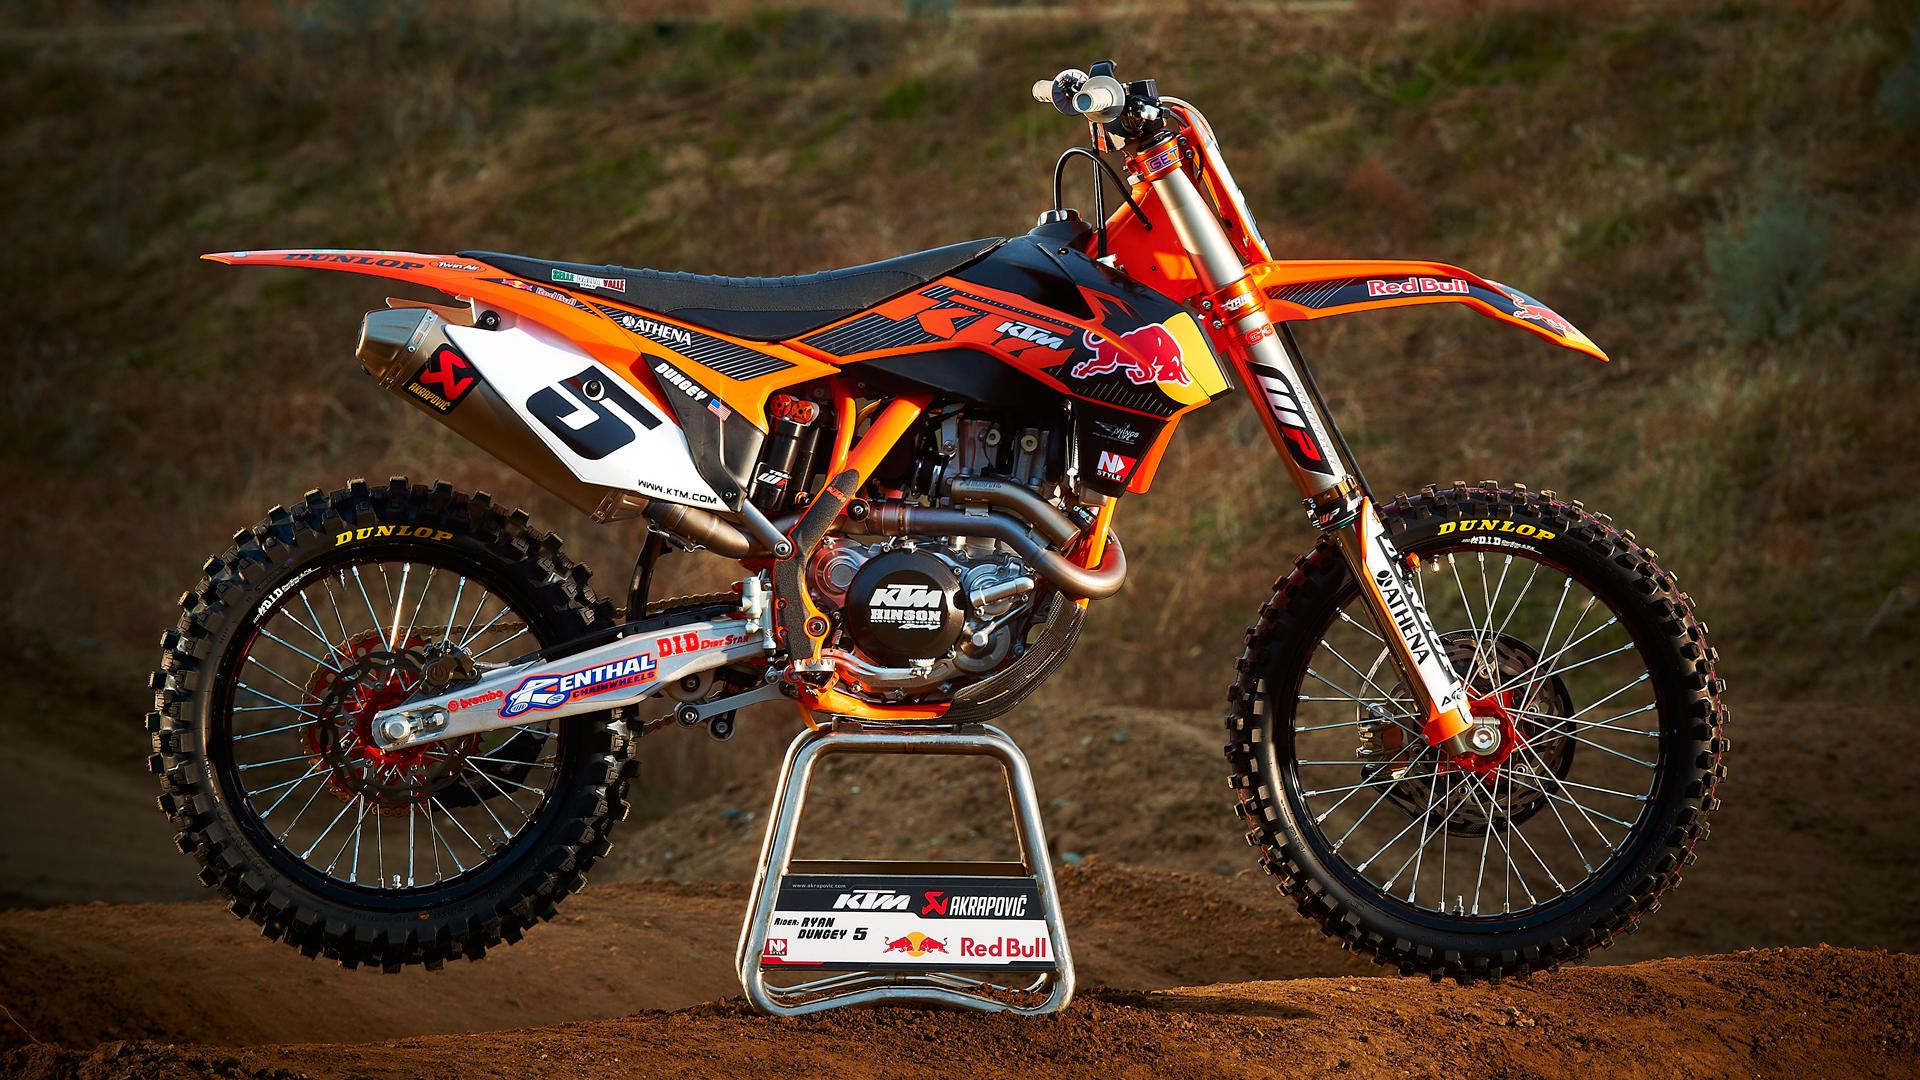 Ktm Bikes Wallpapers Wallpapertag: HD Motocross Wallpapers For Desktop